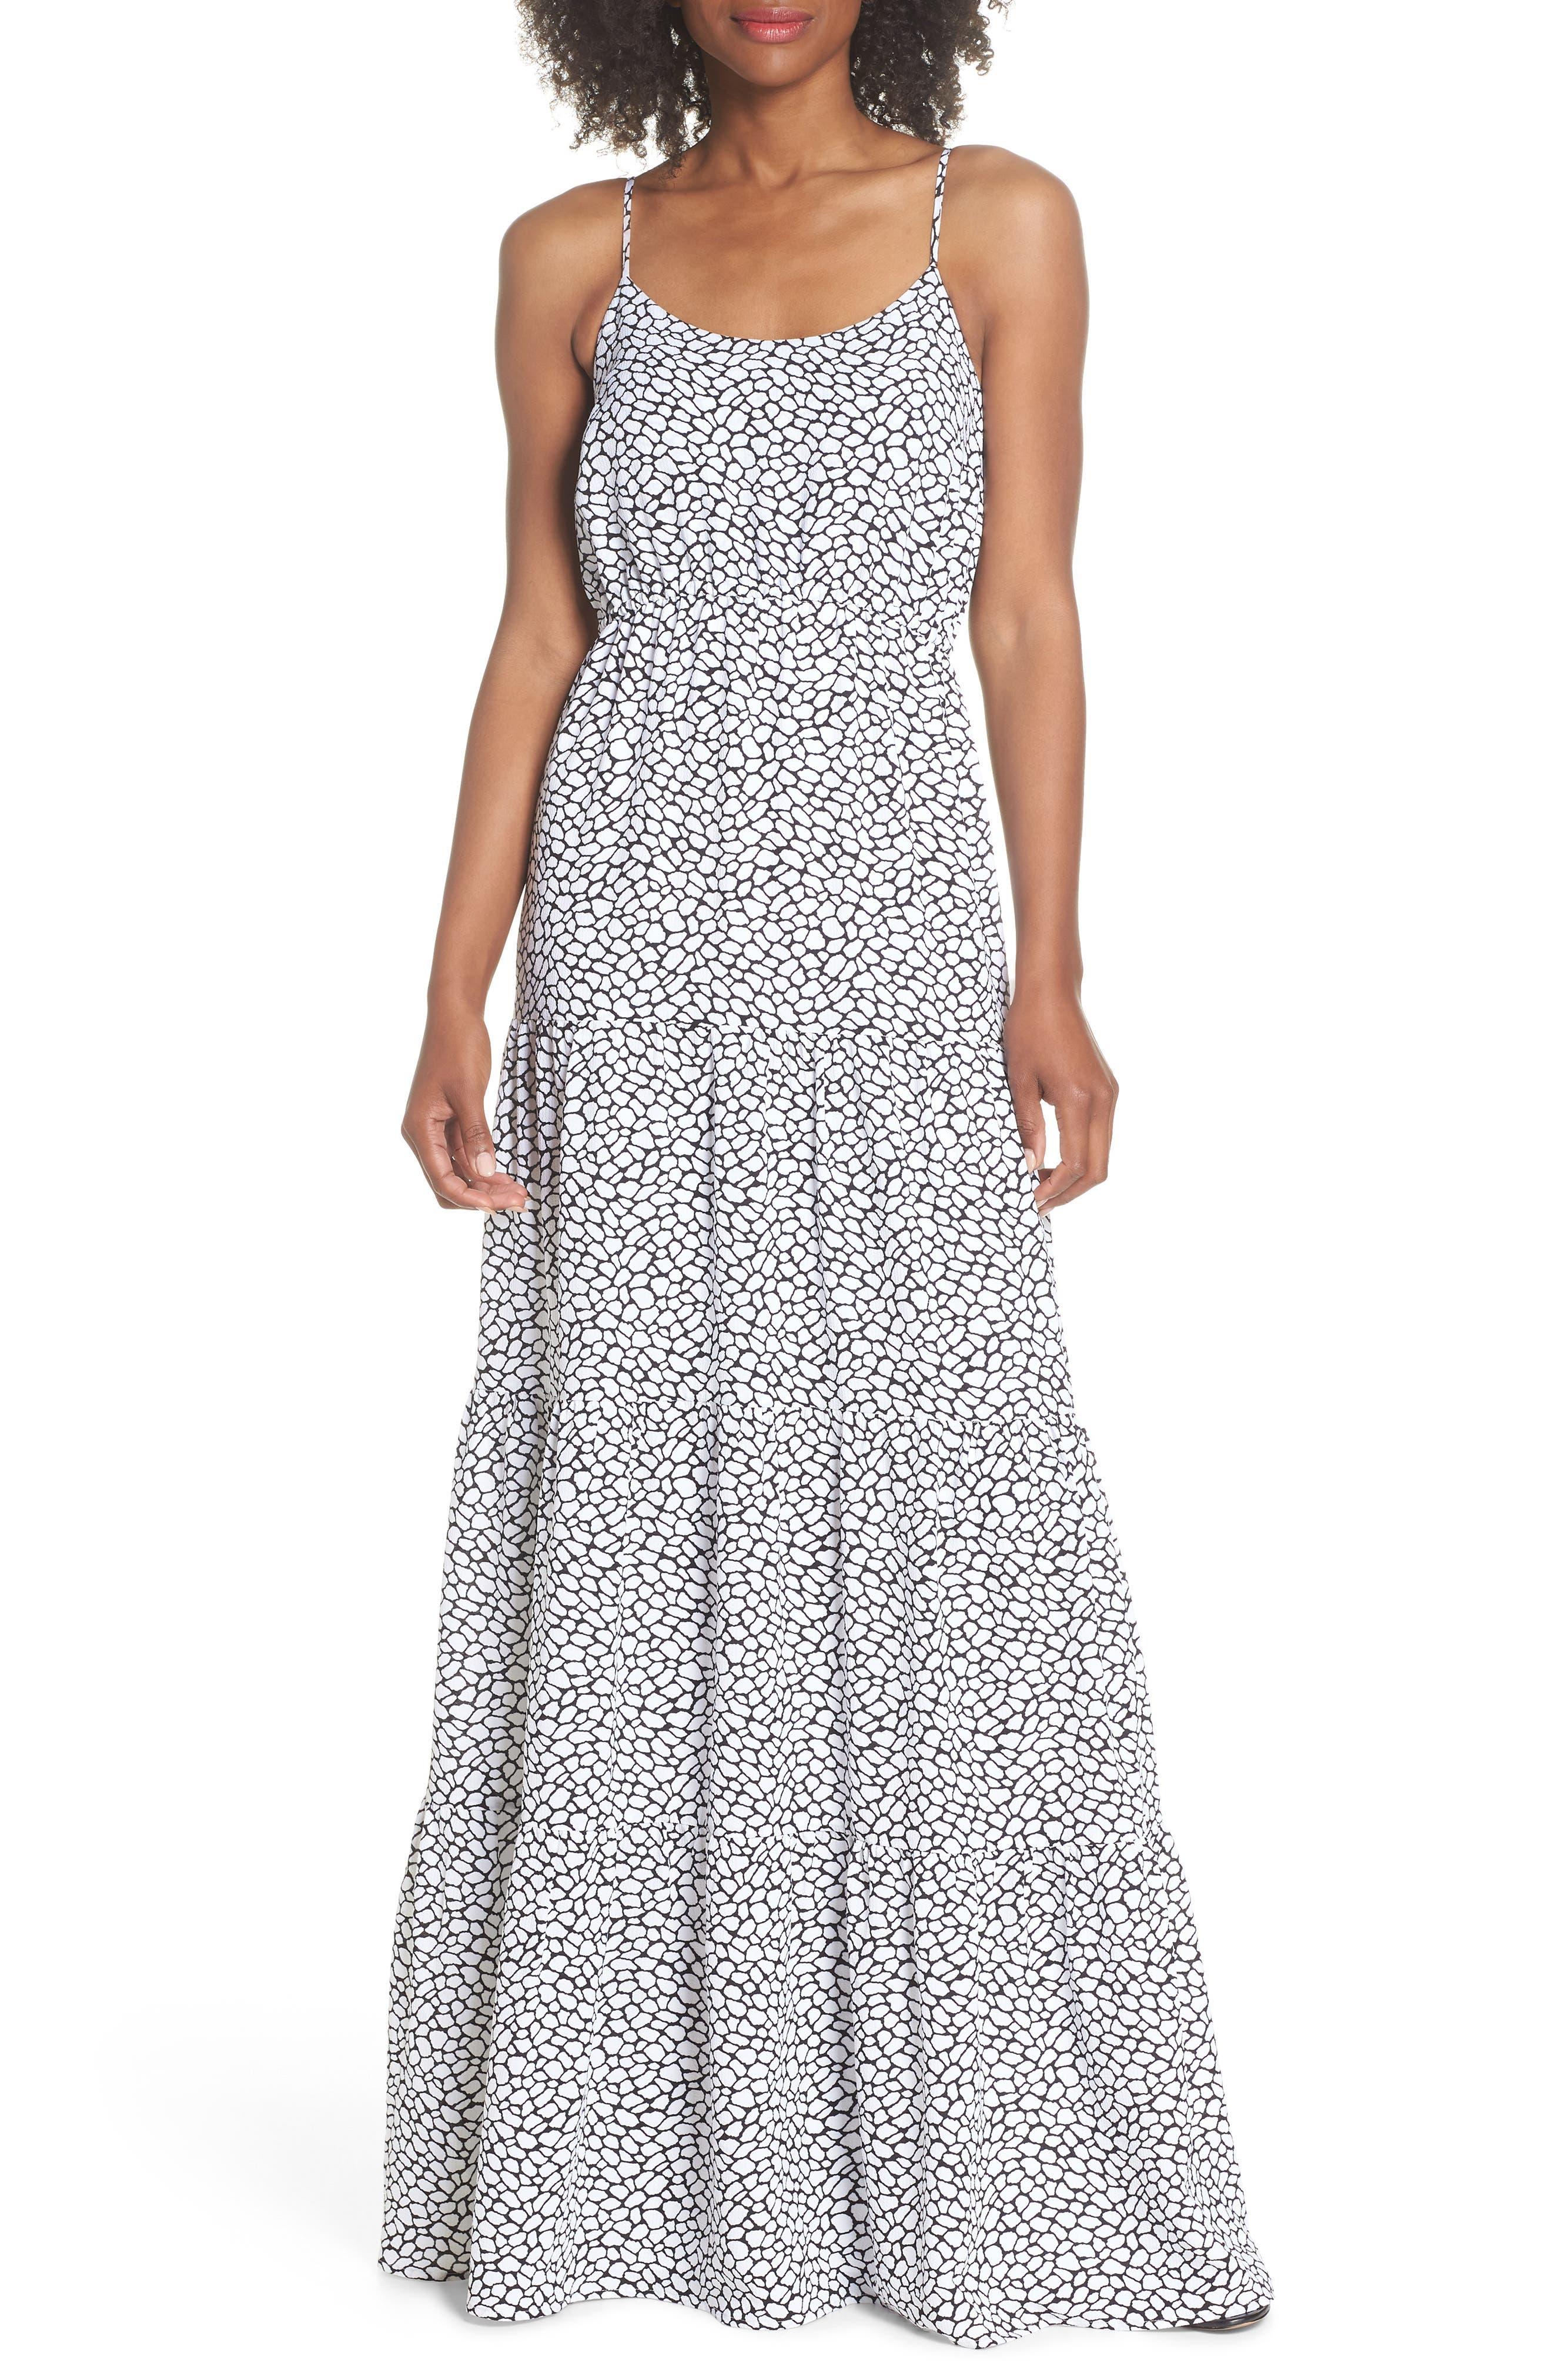 Tiered Maxi Dress,                             Main thumbnail 1, color,                             White/ Black